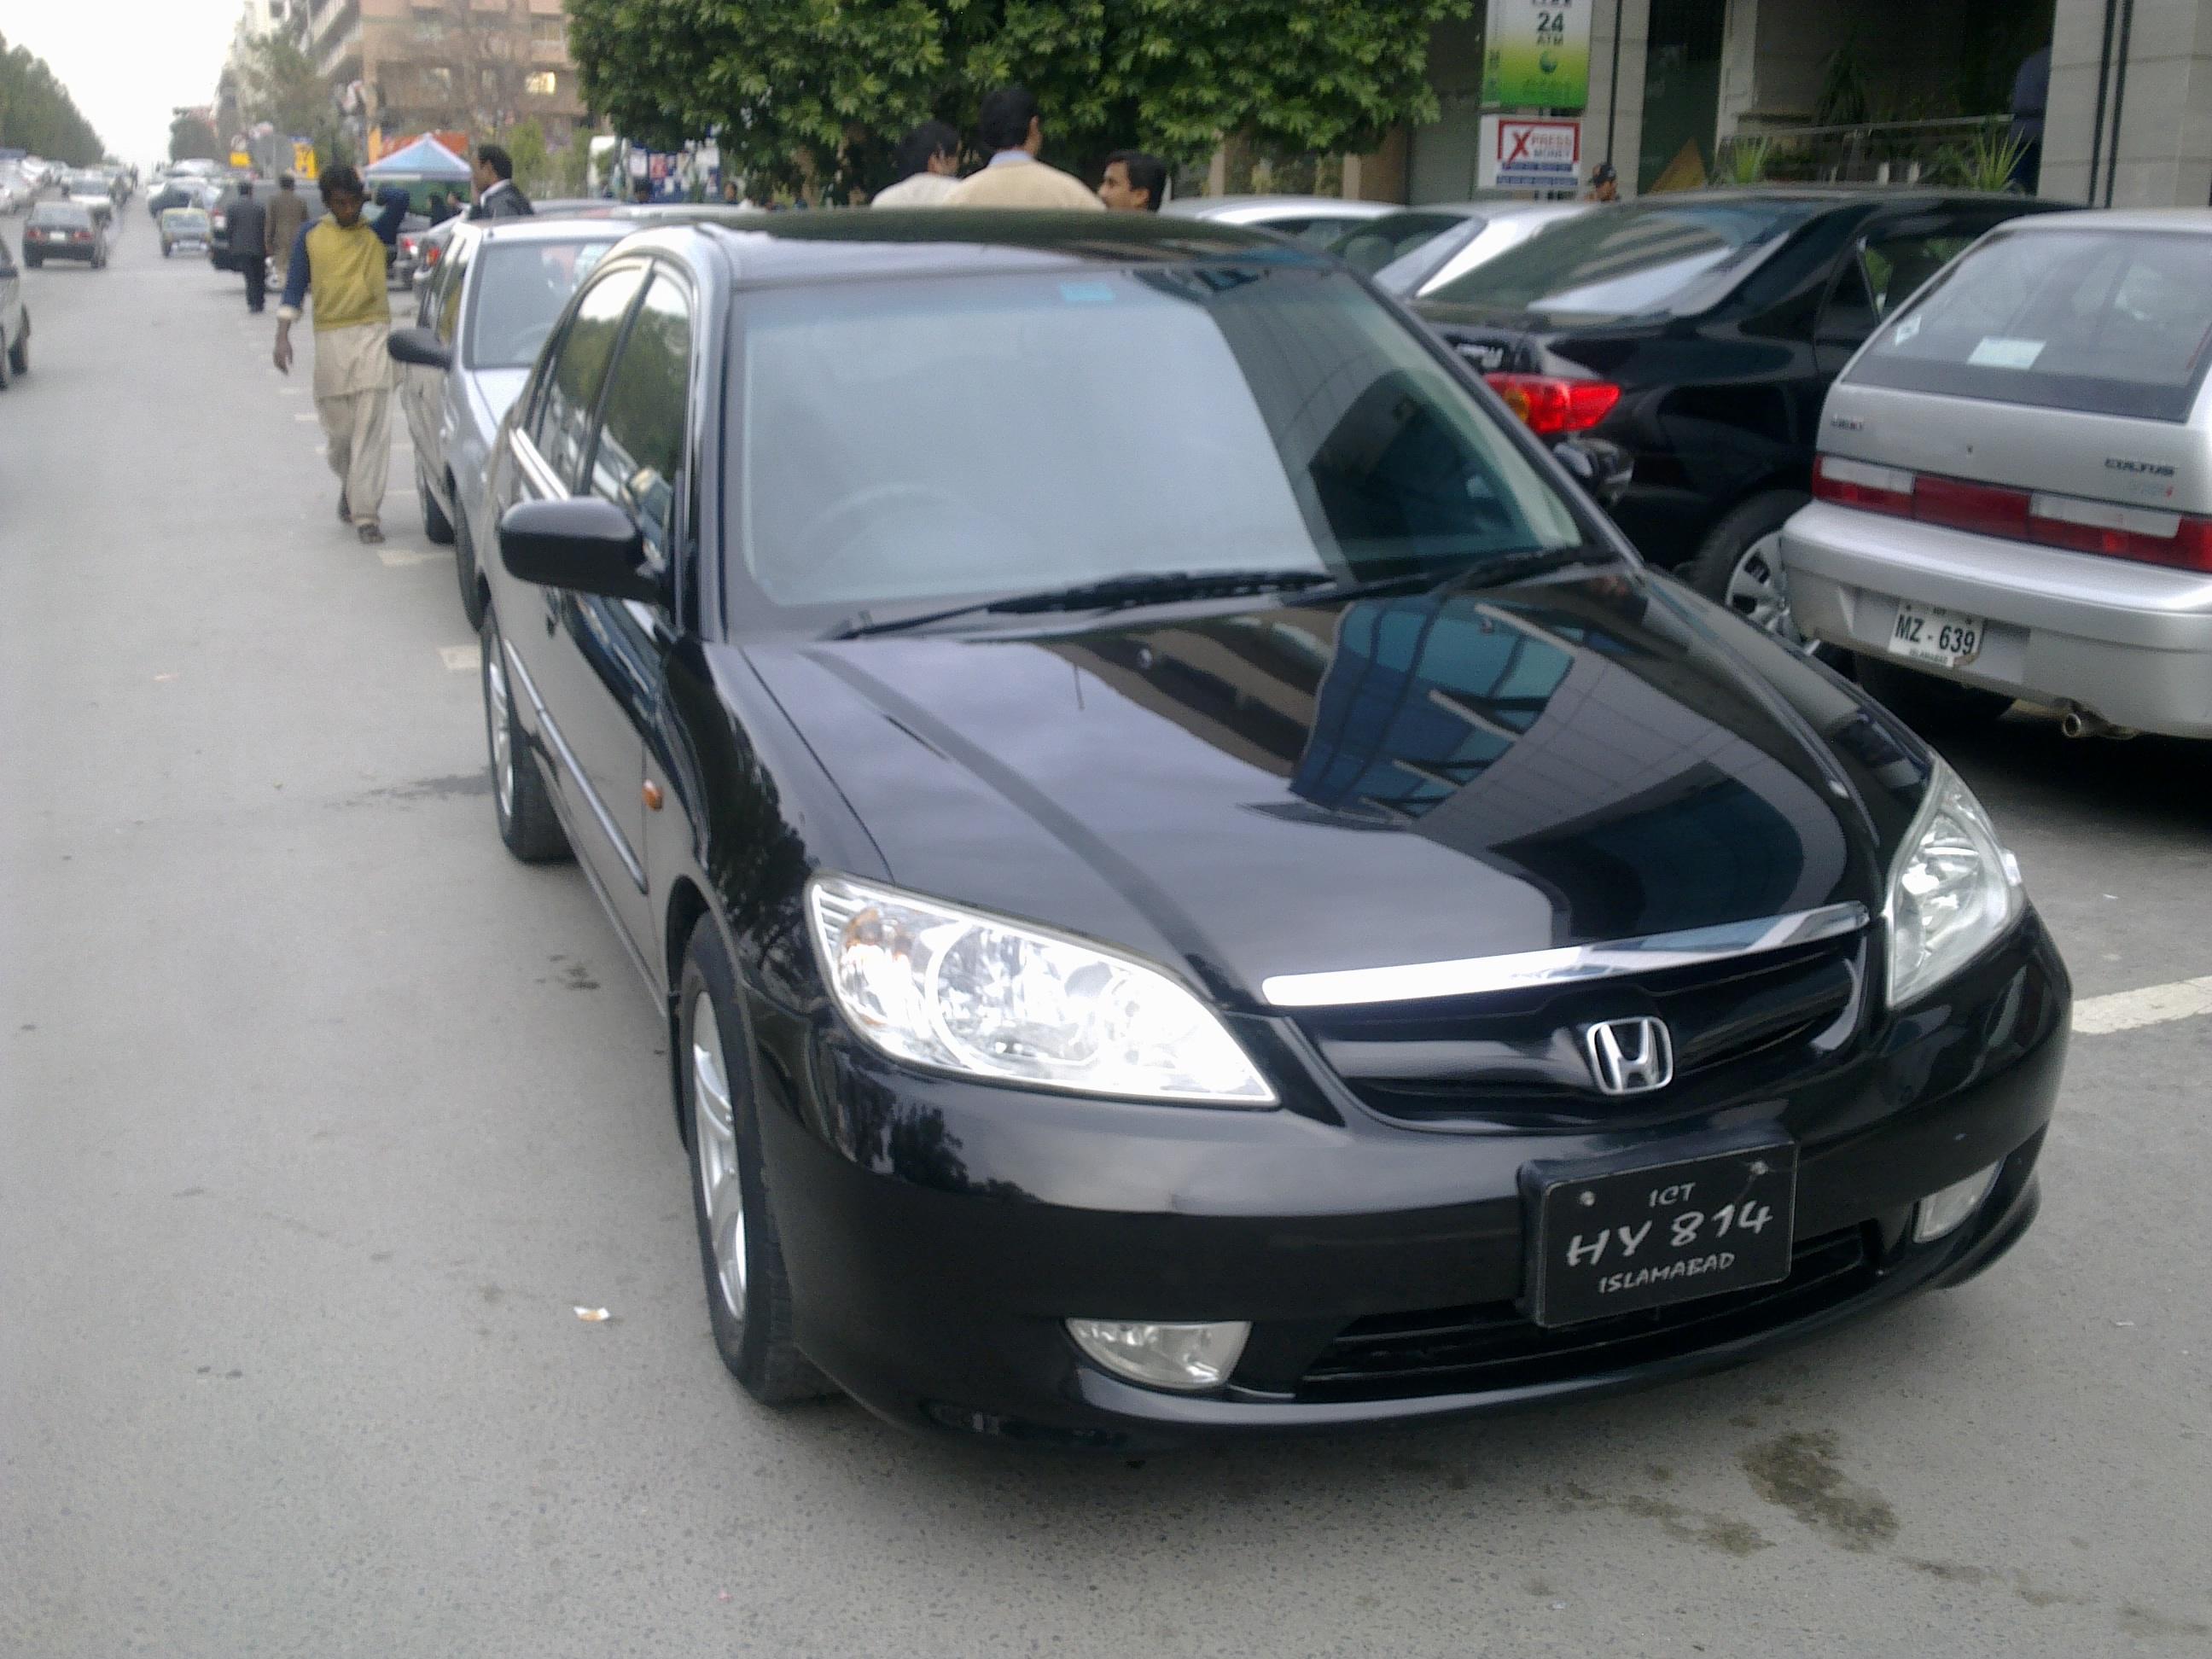 Honda Civic 2005 Of Shahidchheena Member Ride 15513